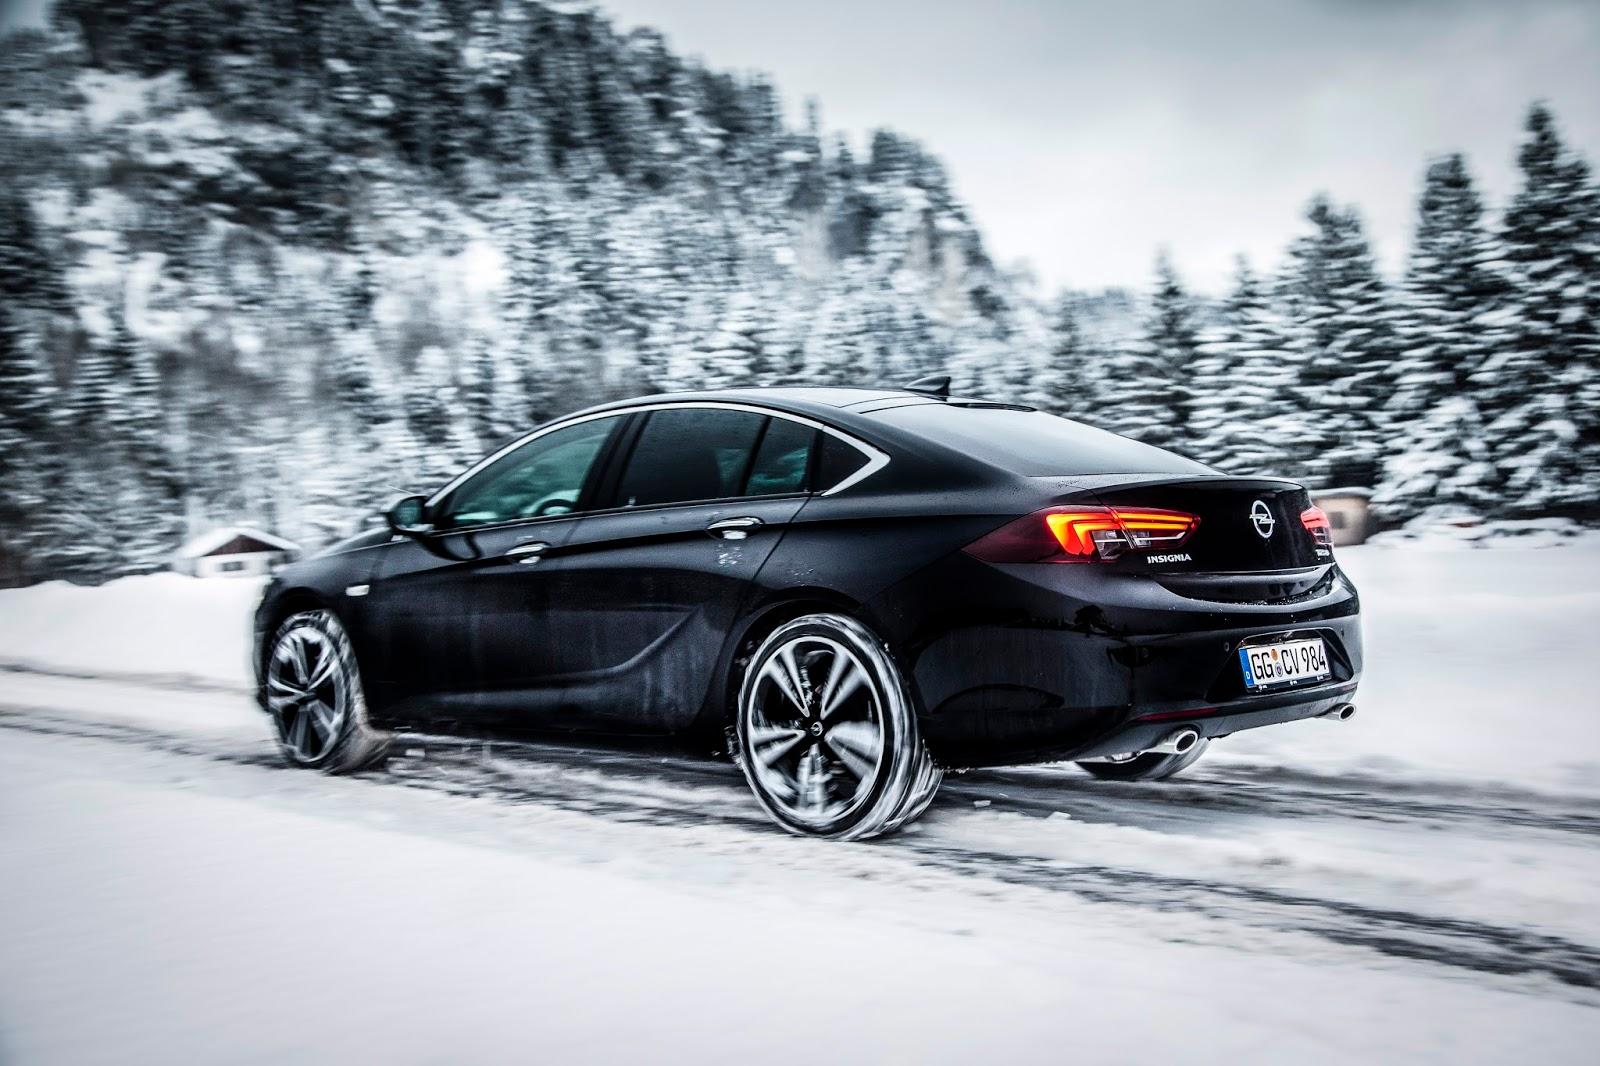 Opel Insignia Grand Sport 304914 1 Νέο Opel Insignia 4x4, με σύστημα κατανομής ροπής χωρίς διαφορικό !